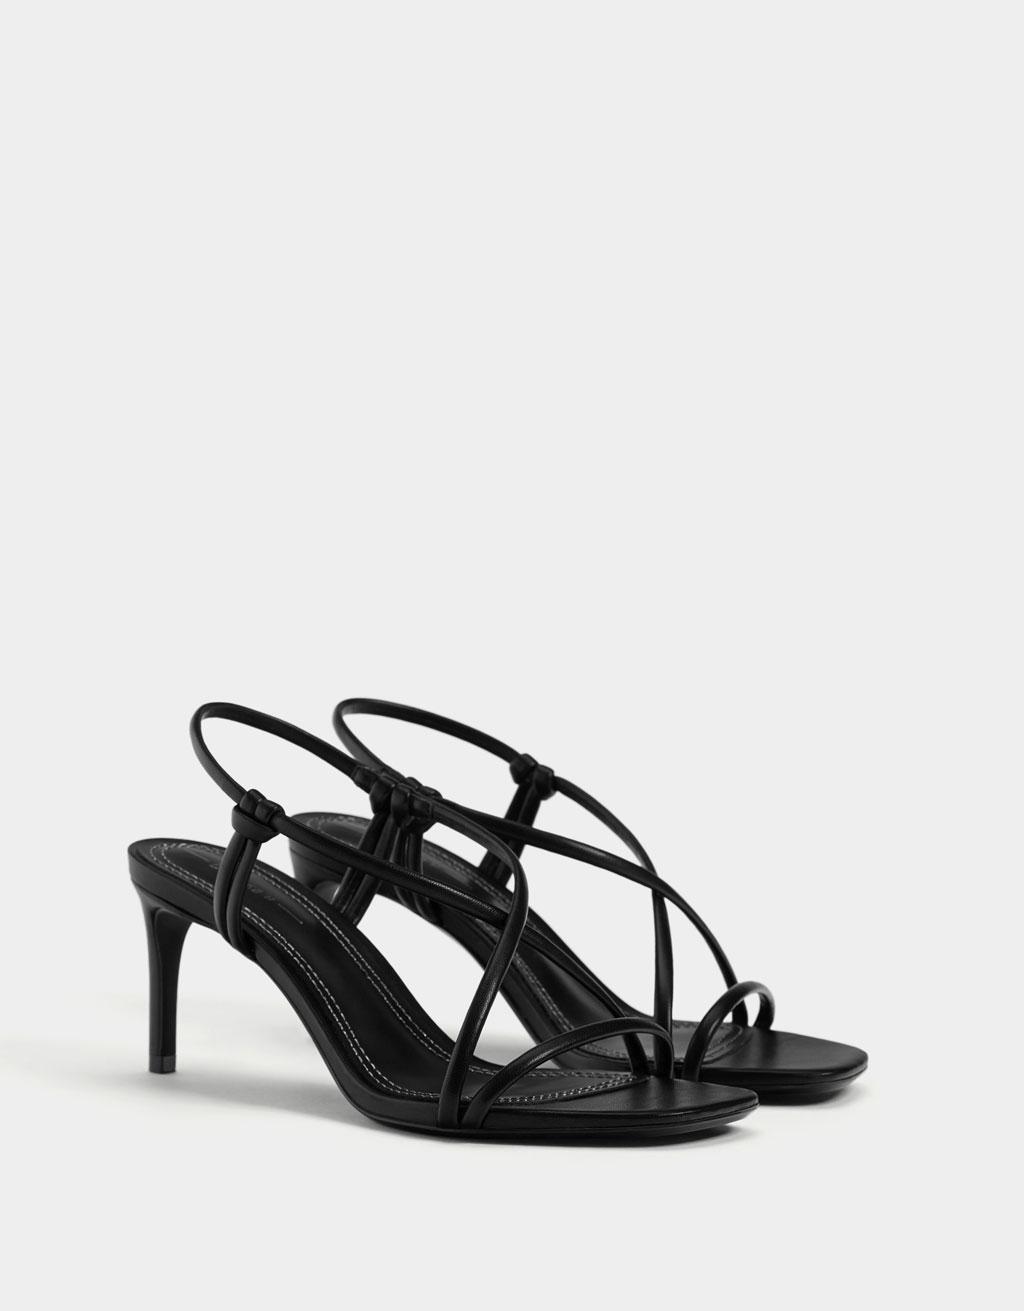 Sandale mit rohrförmigem Absatz